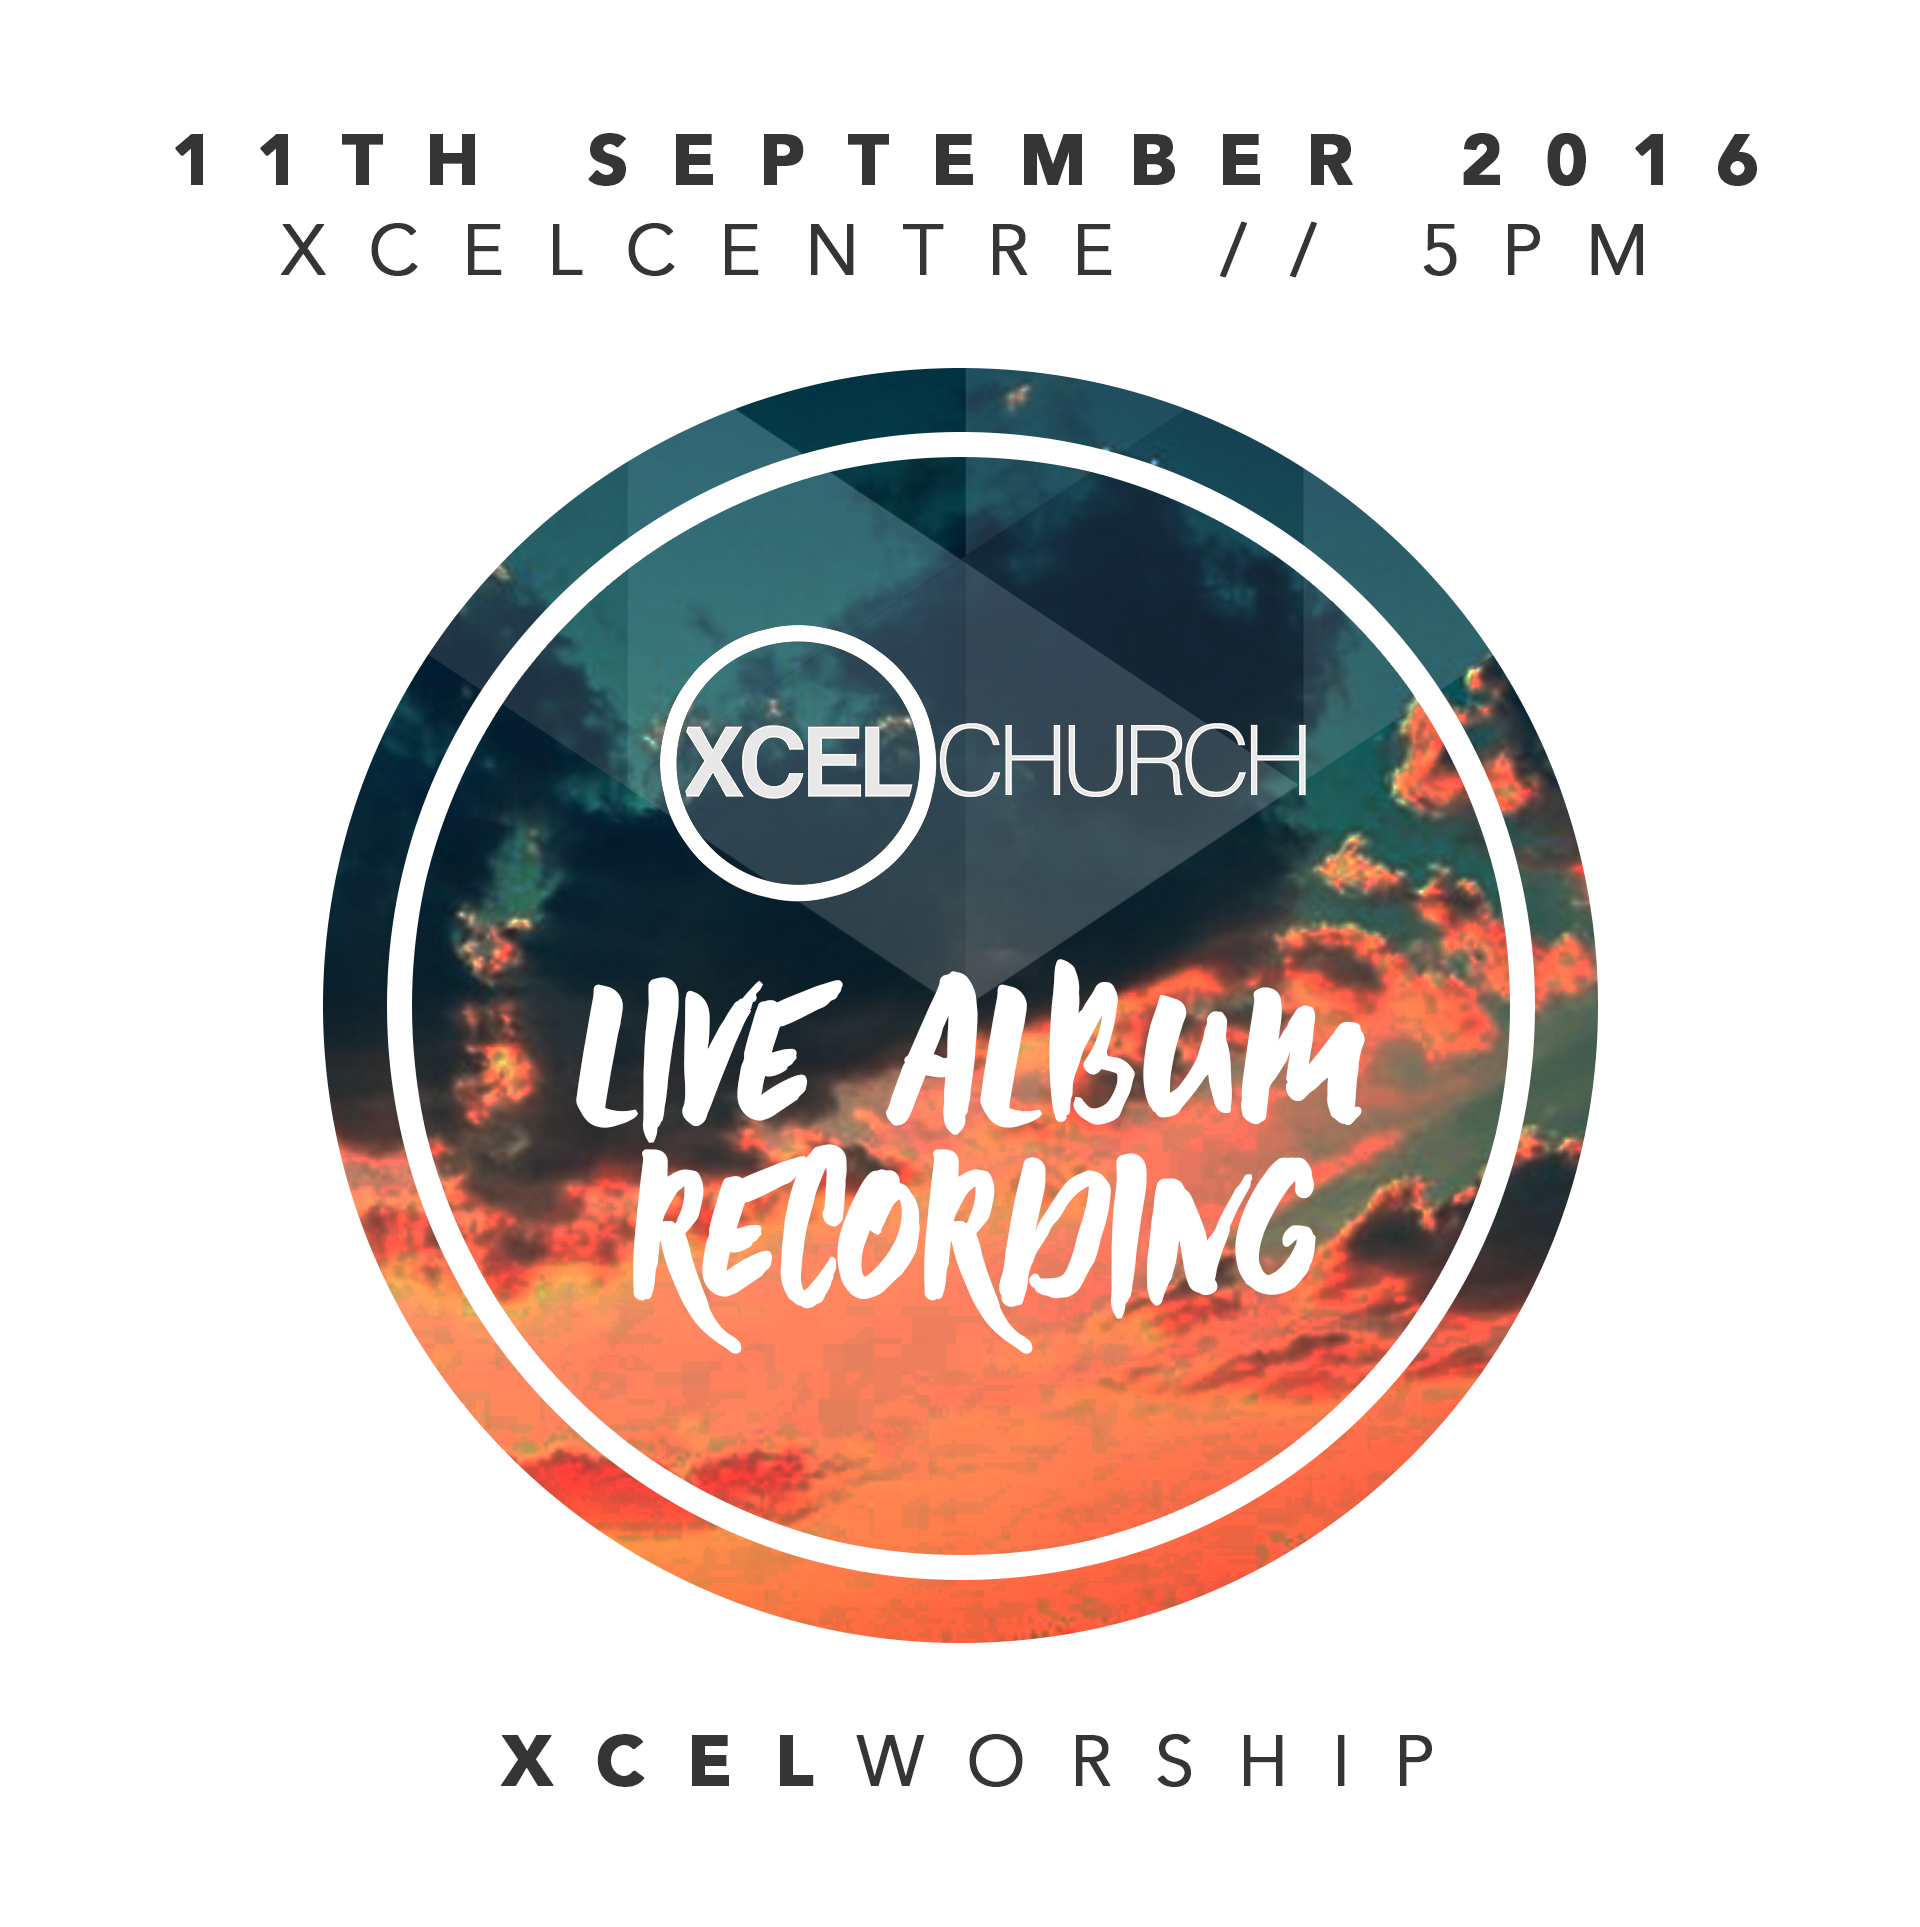 Live Worship Album Recording @ XCEL Church